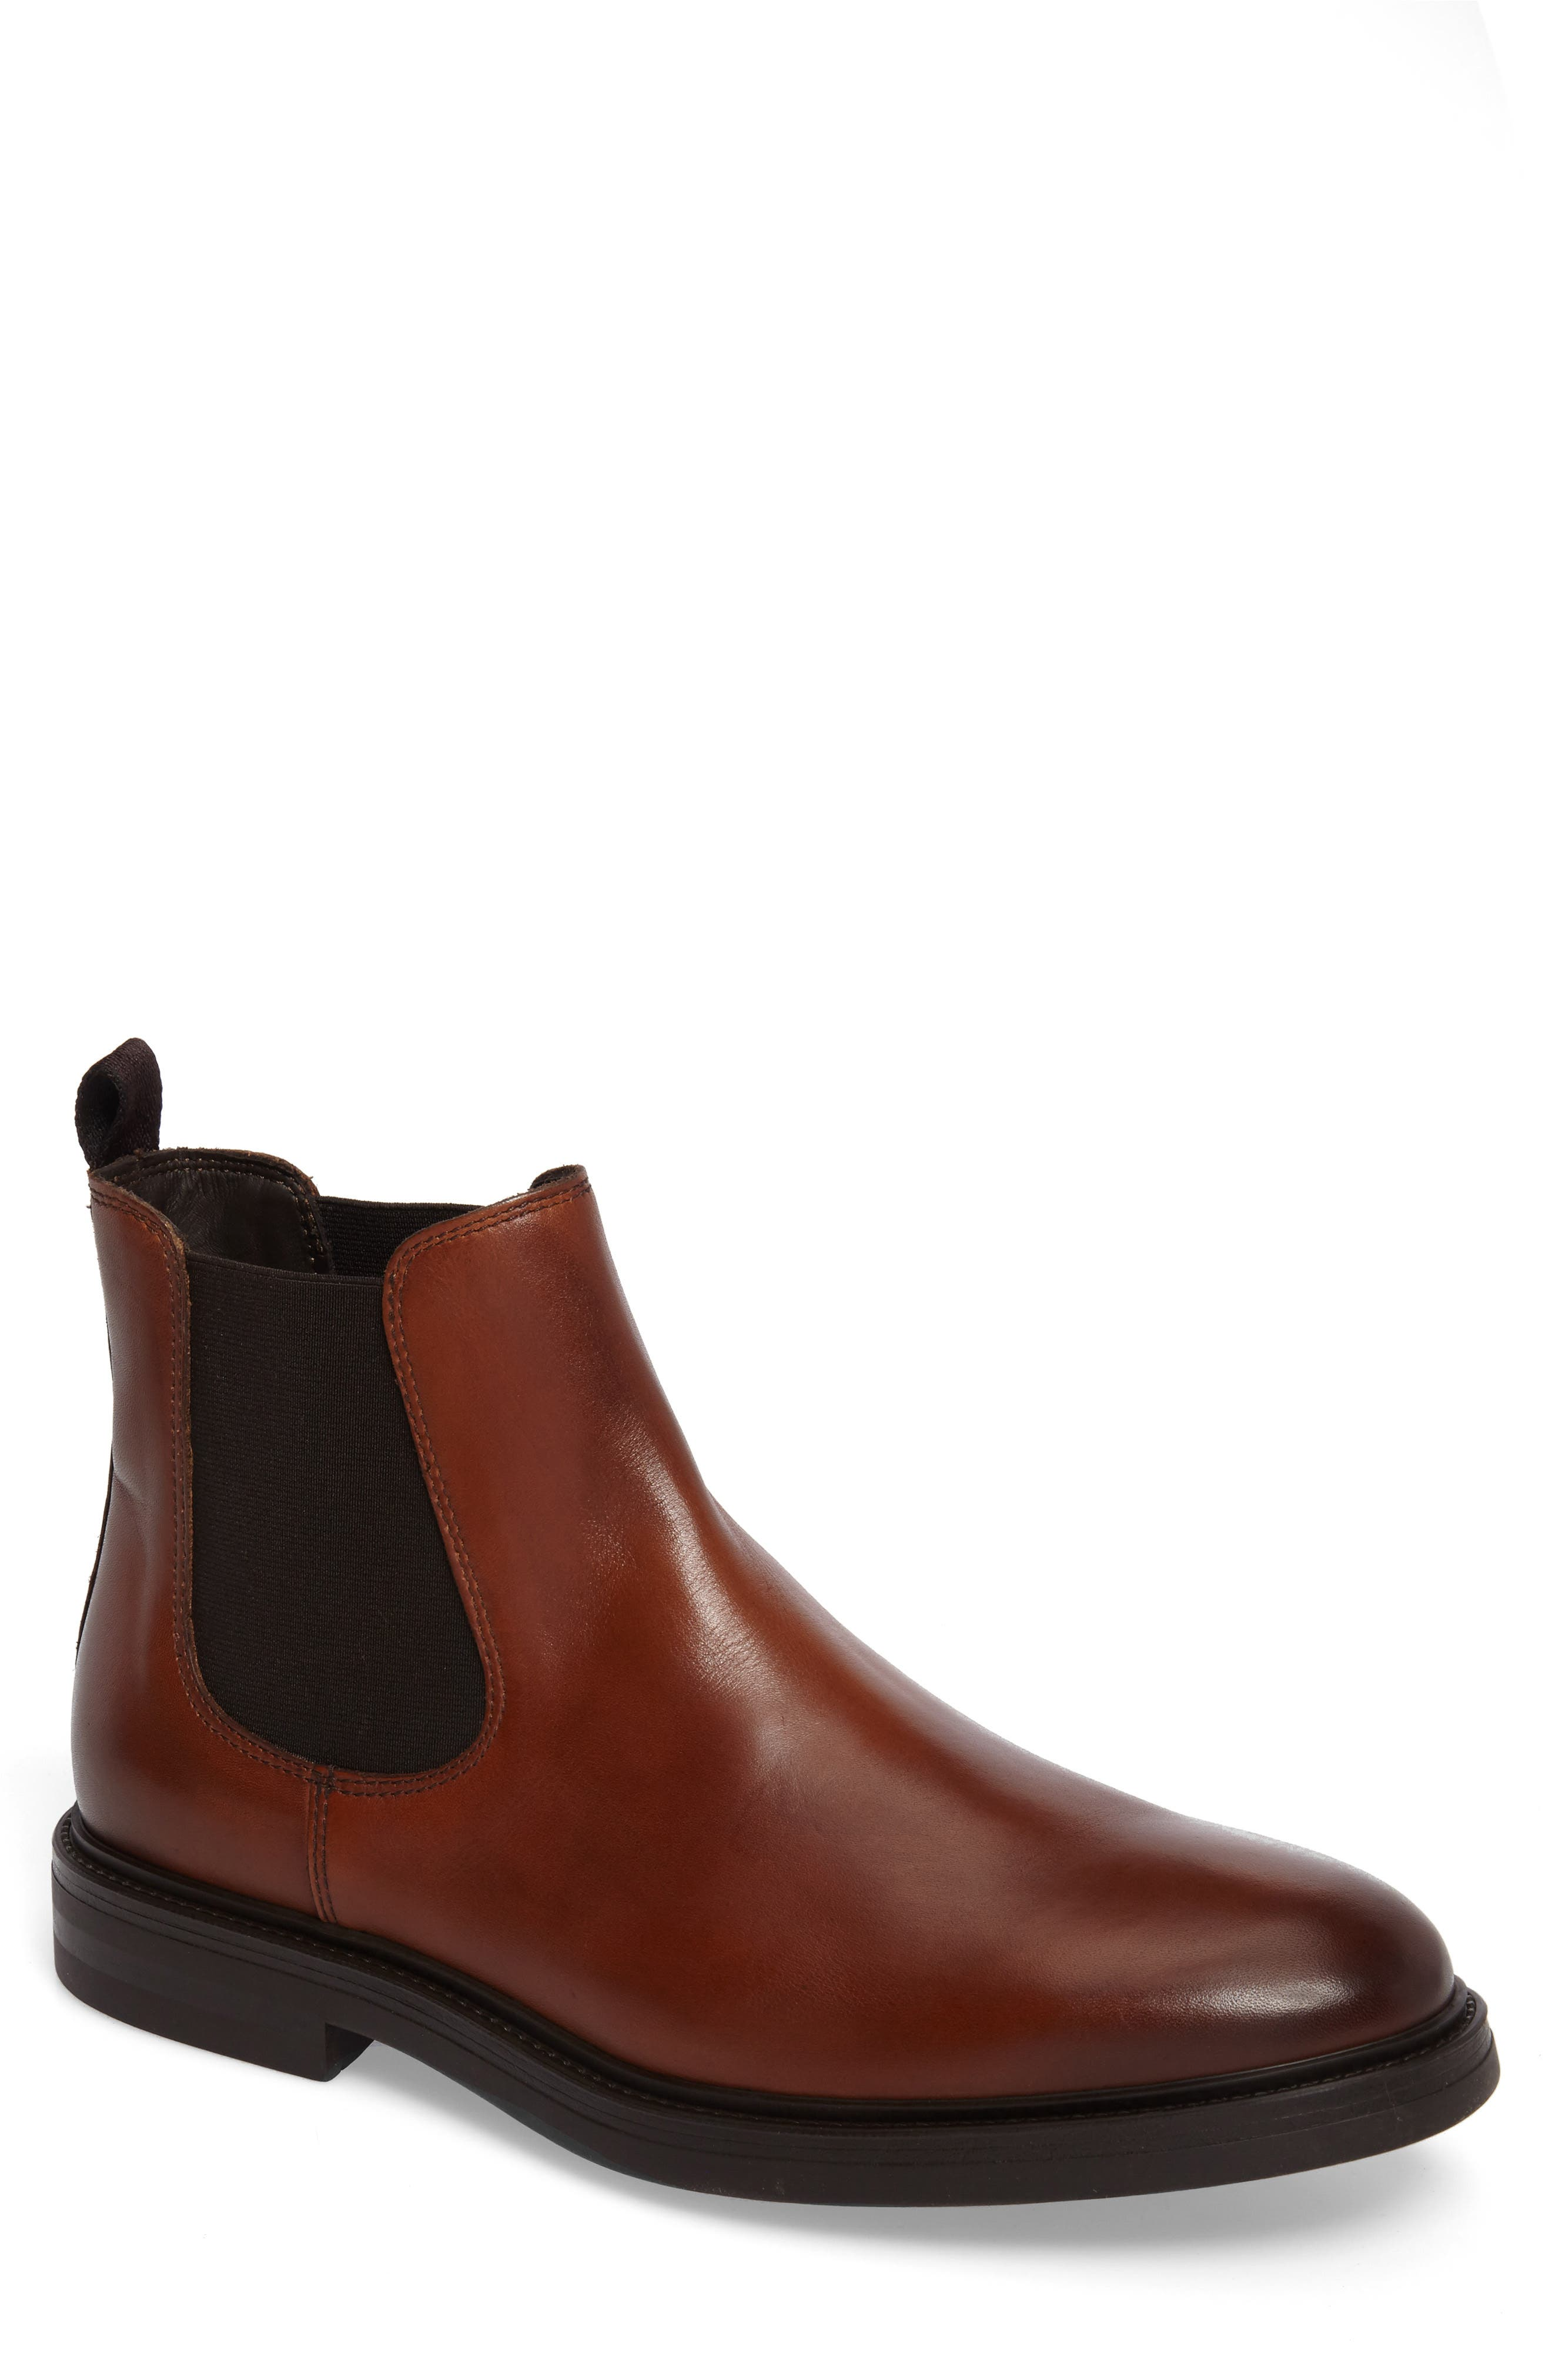 Chelsea Boot,                             Main thumbnail 1, color,                             Caramel